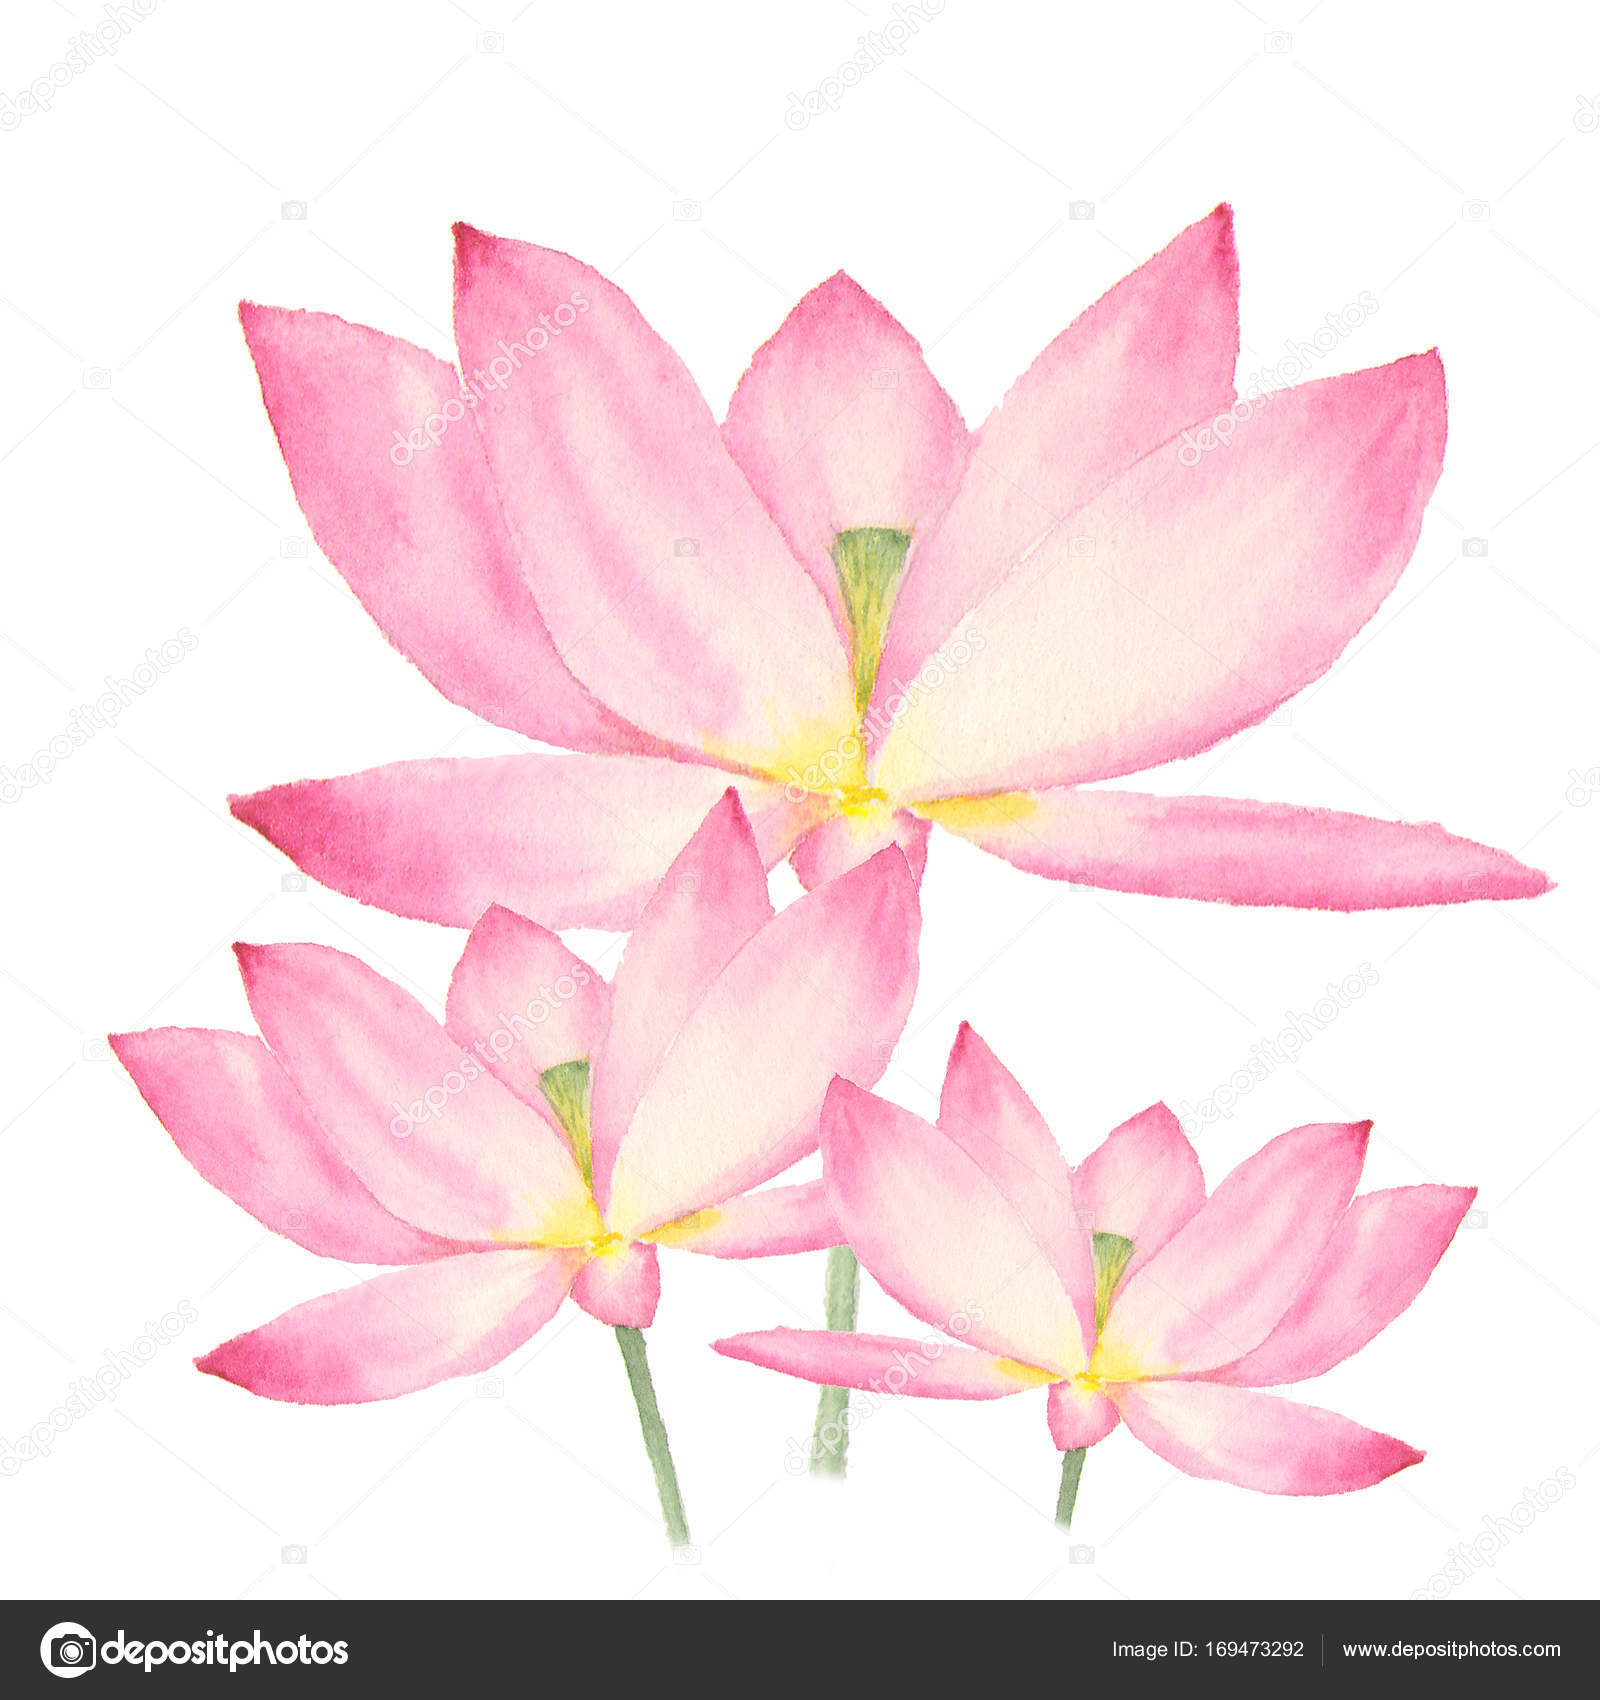 Botanical Watercolor Illustration Of Lotus Flowers On White